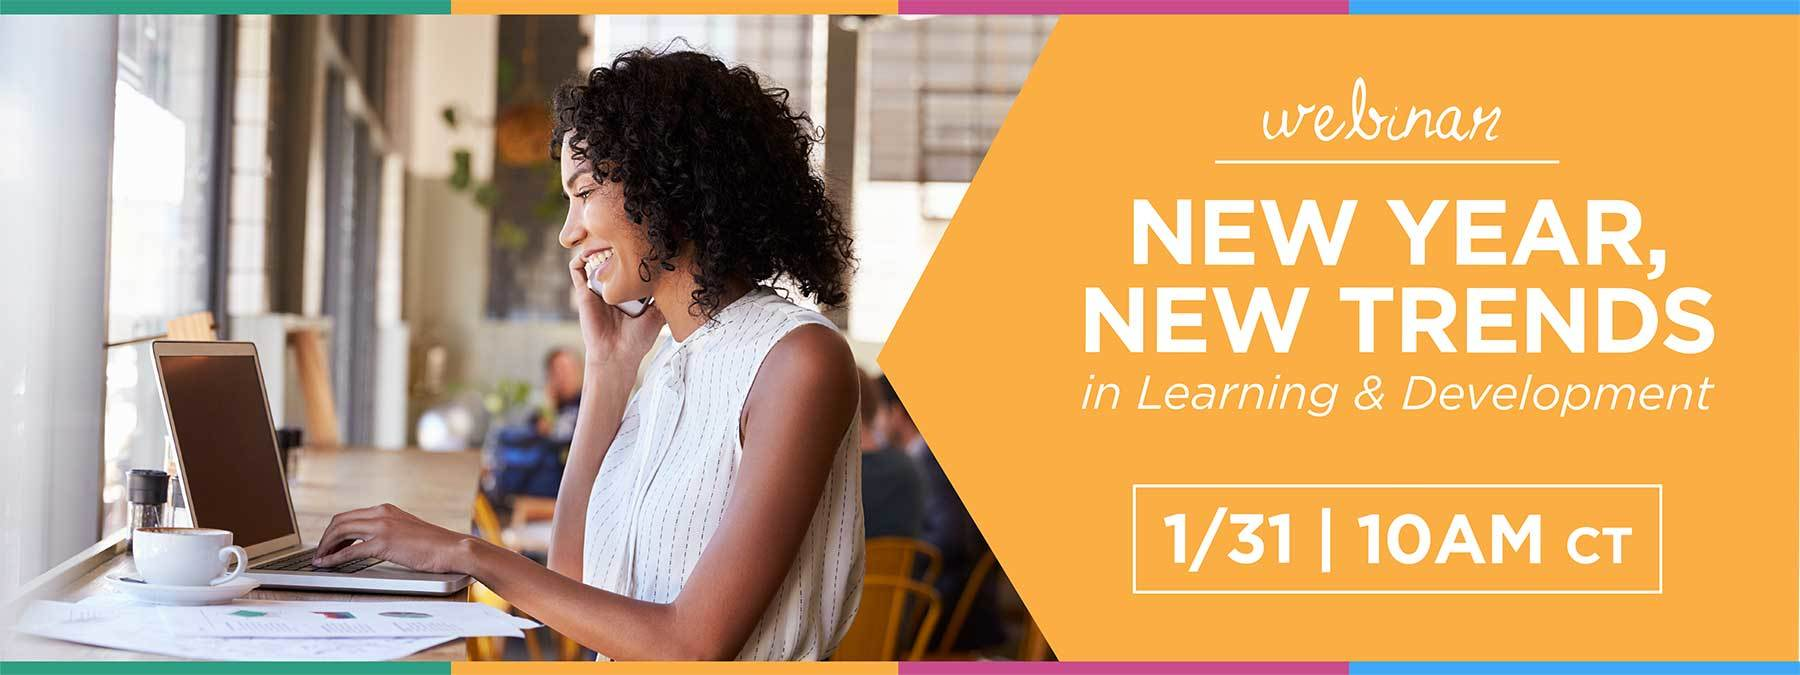 Webinar: New Year, New Trends in Learning & Development thumbnail